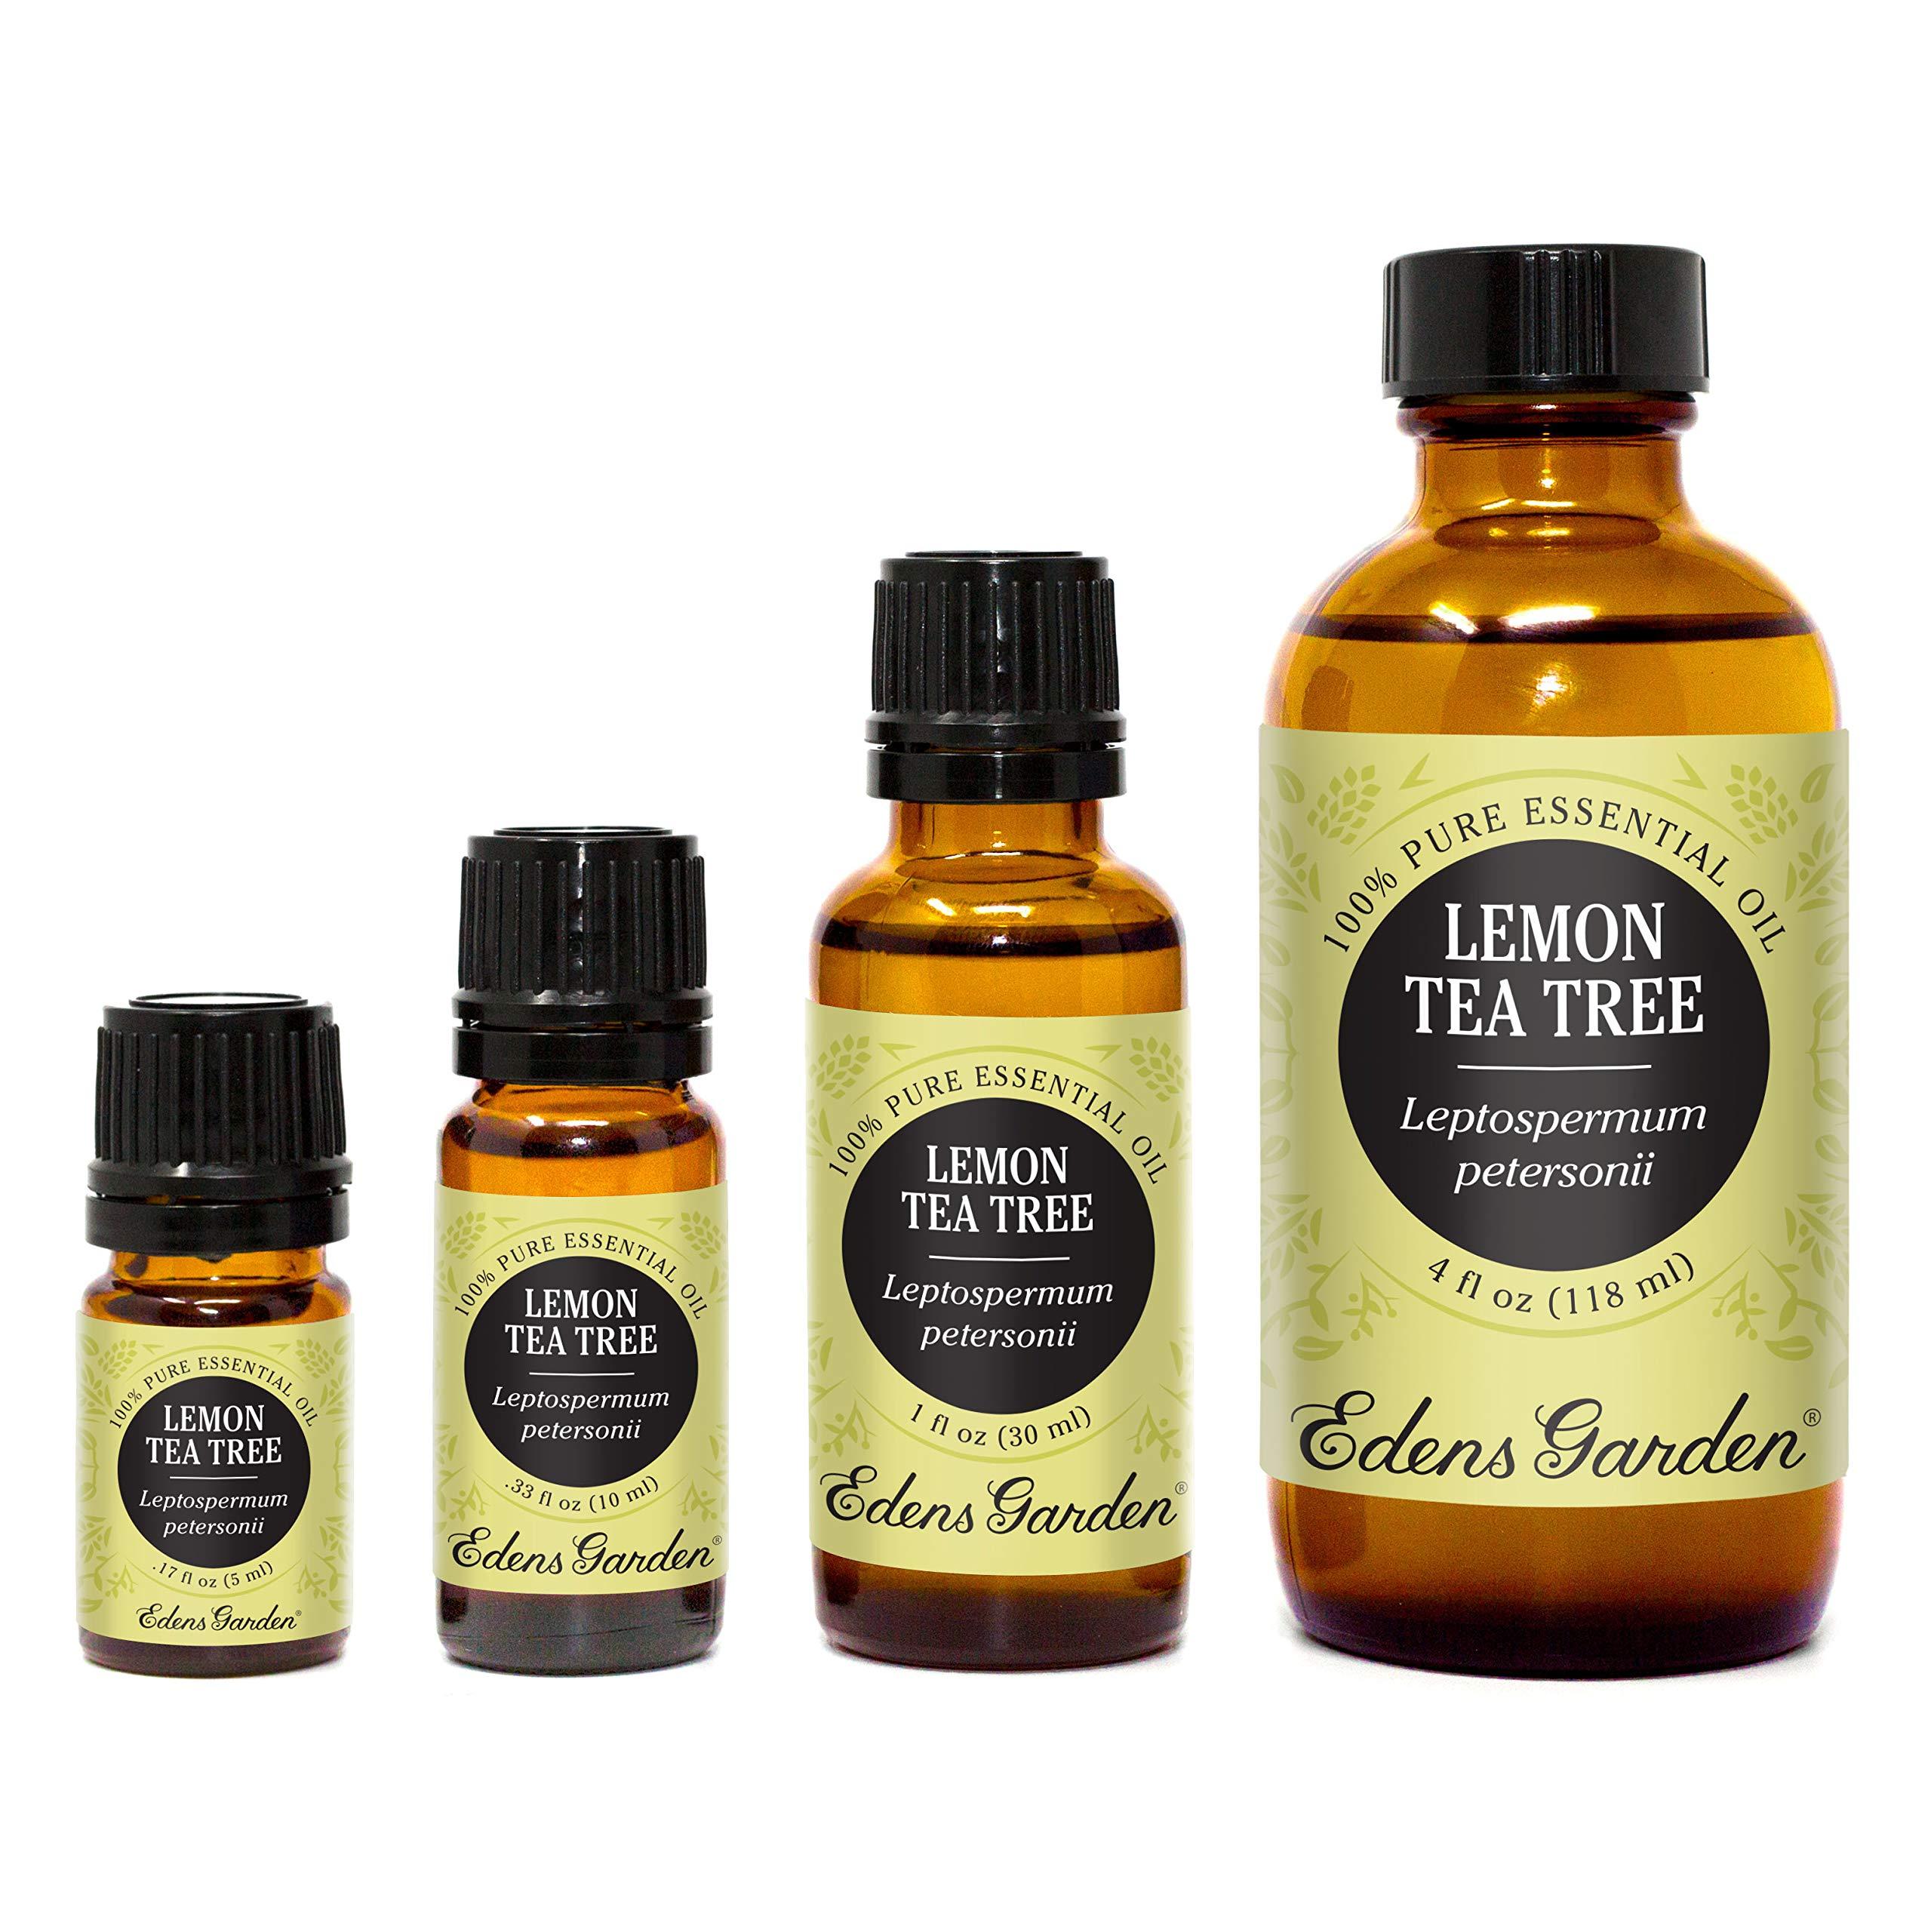 Edens Garden Lemon Tea Tree 100% Pure Therapeutic Grade Essential Oil, 30 mL